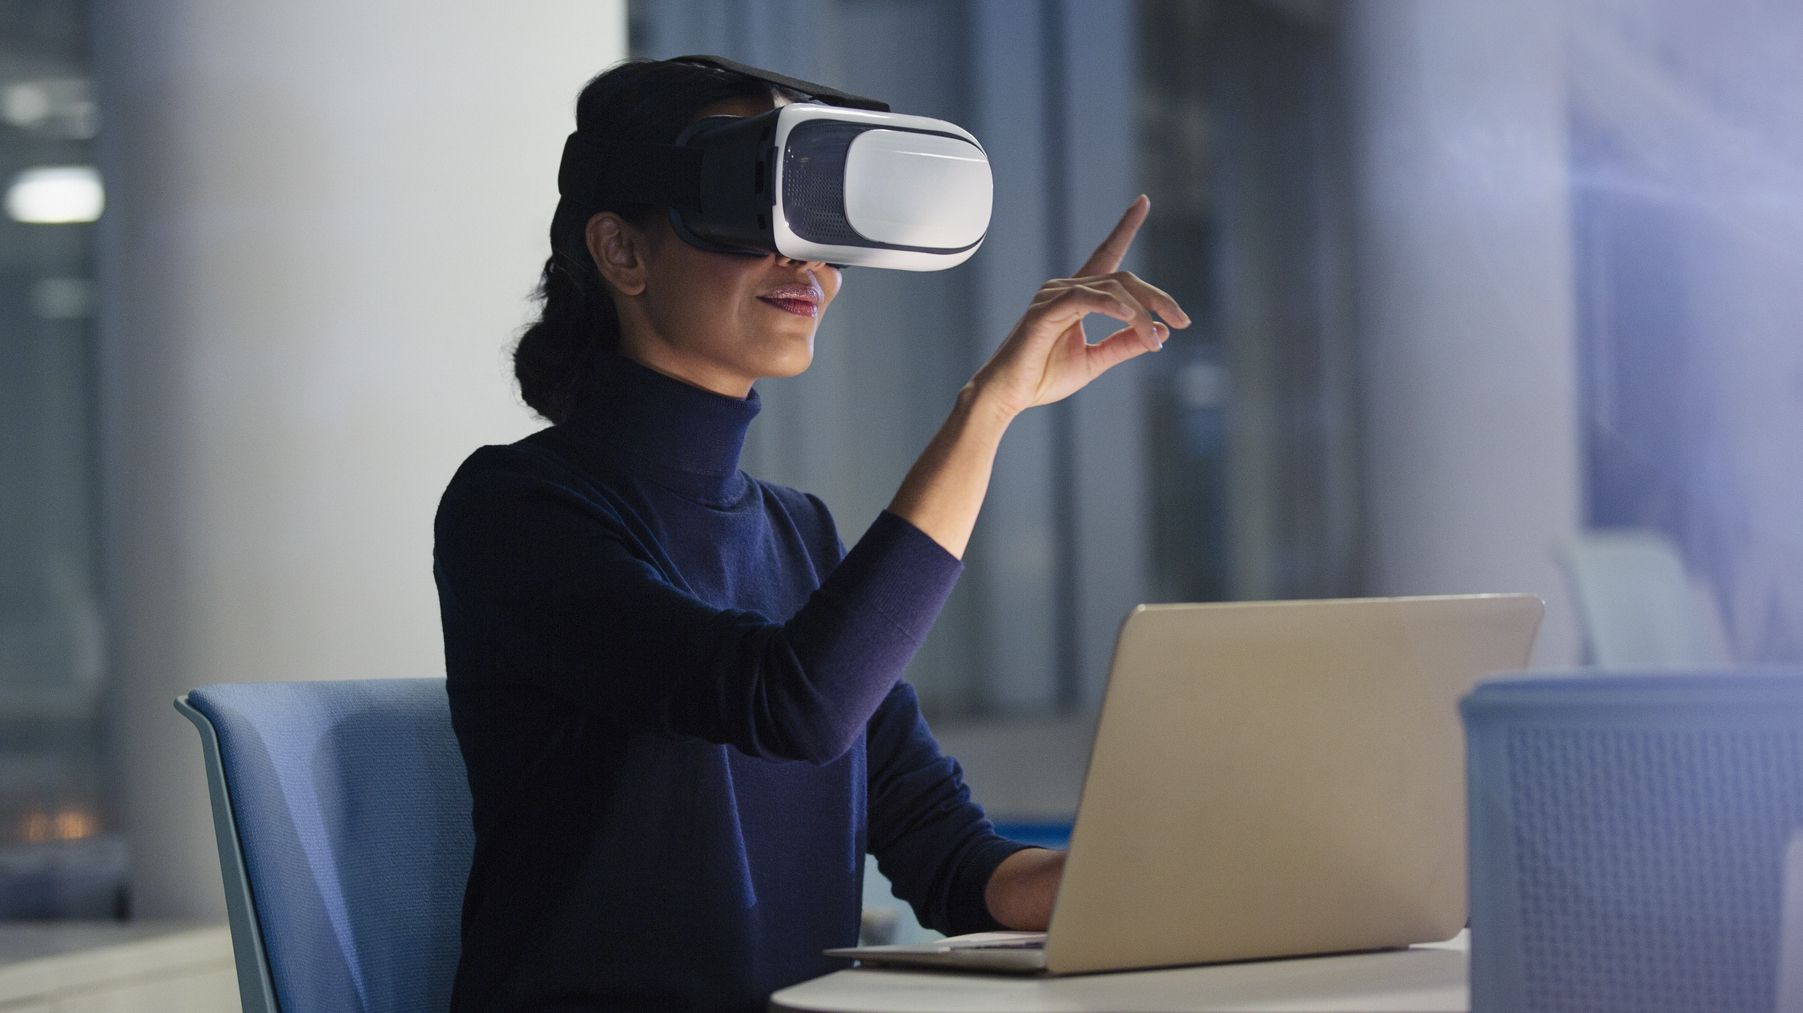 The 8 Best Laptops for VR of 2019